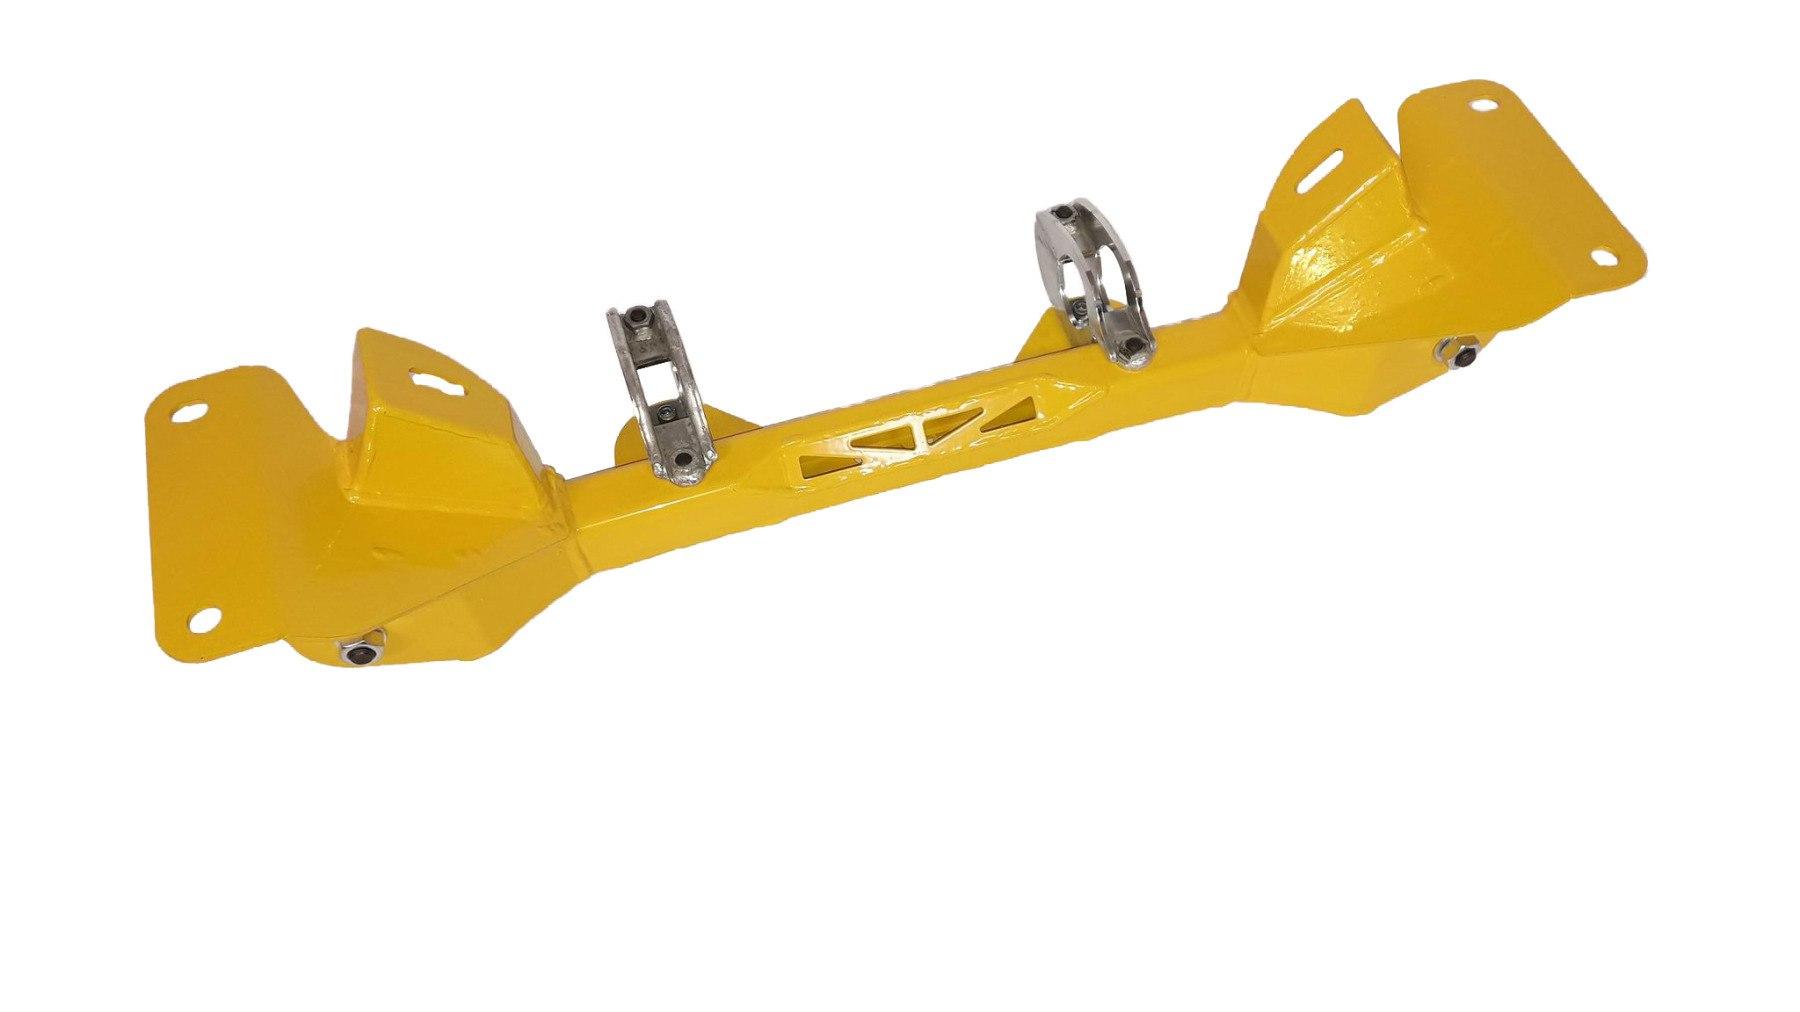 Zestaw skrętu Nissan S14/15 FAT - GRUBYGARAGE - Sklep Tuningowy